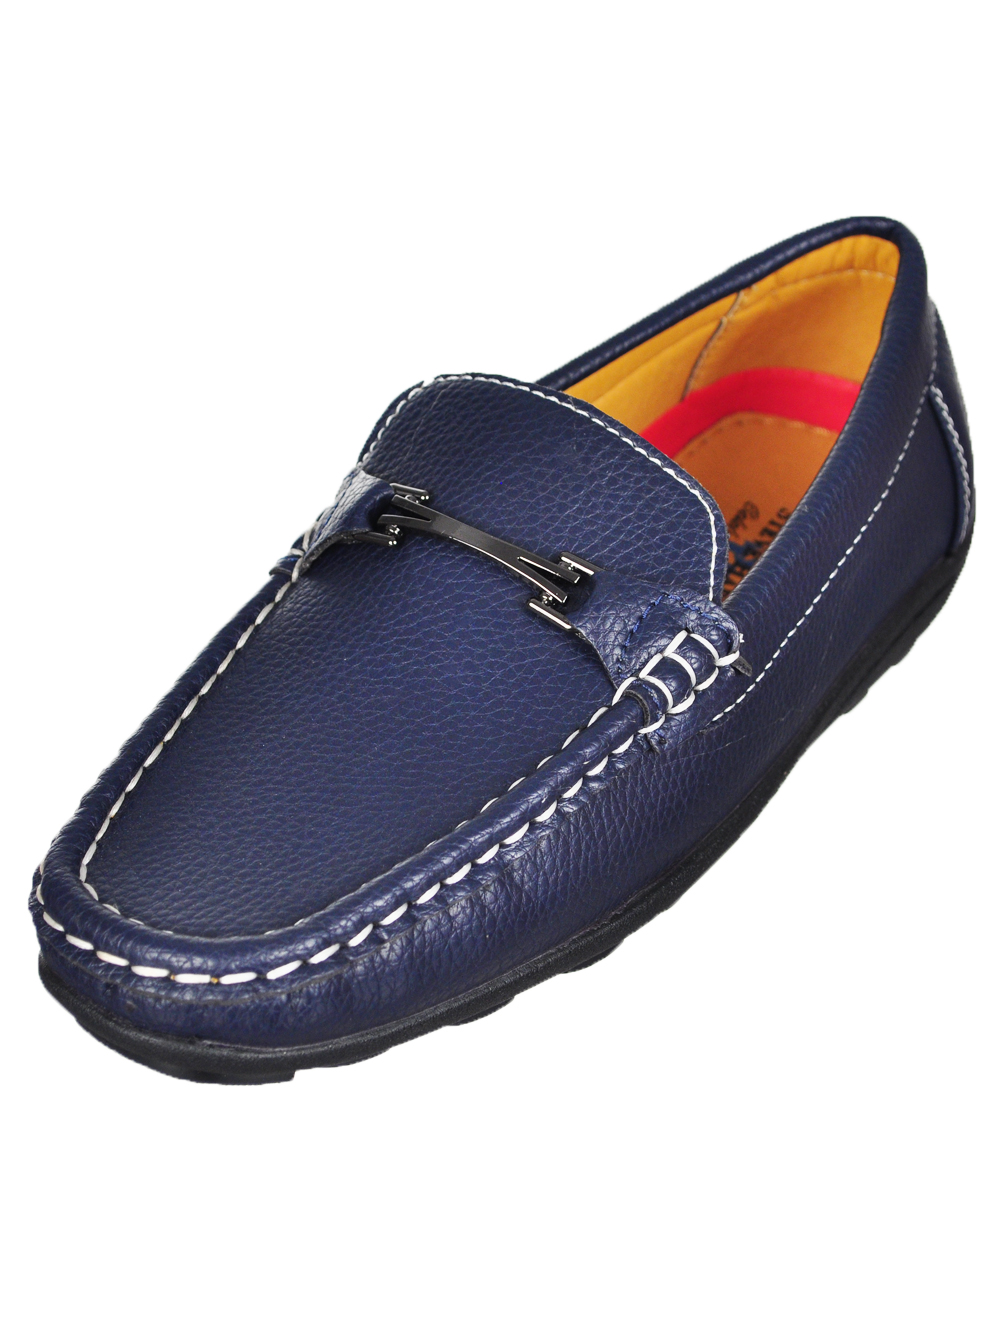 Steve Harvey Boys' Driving Loafers (Sizes 11 - 7)